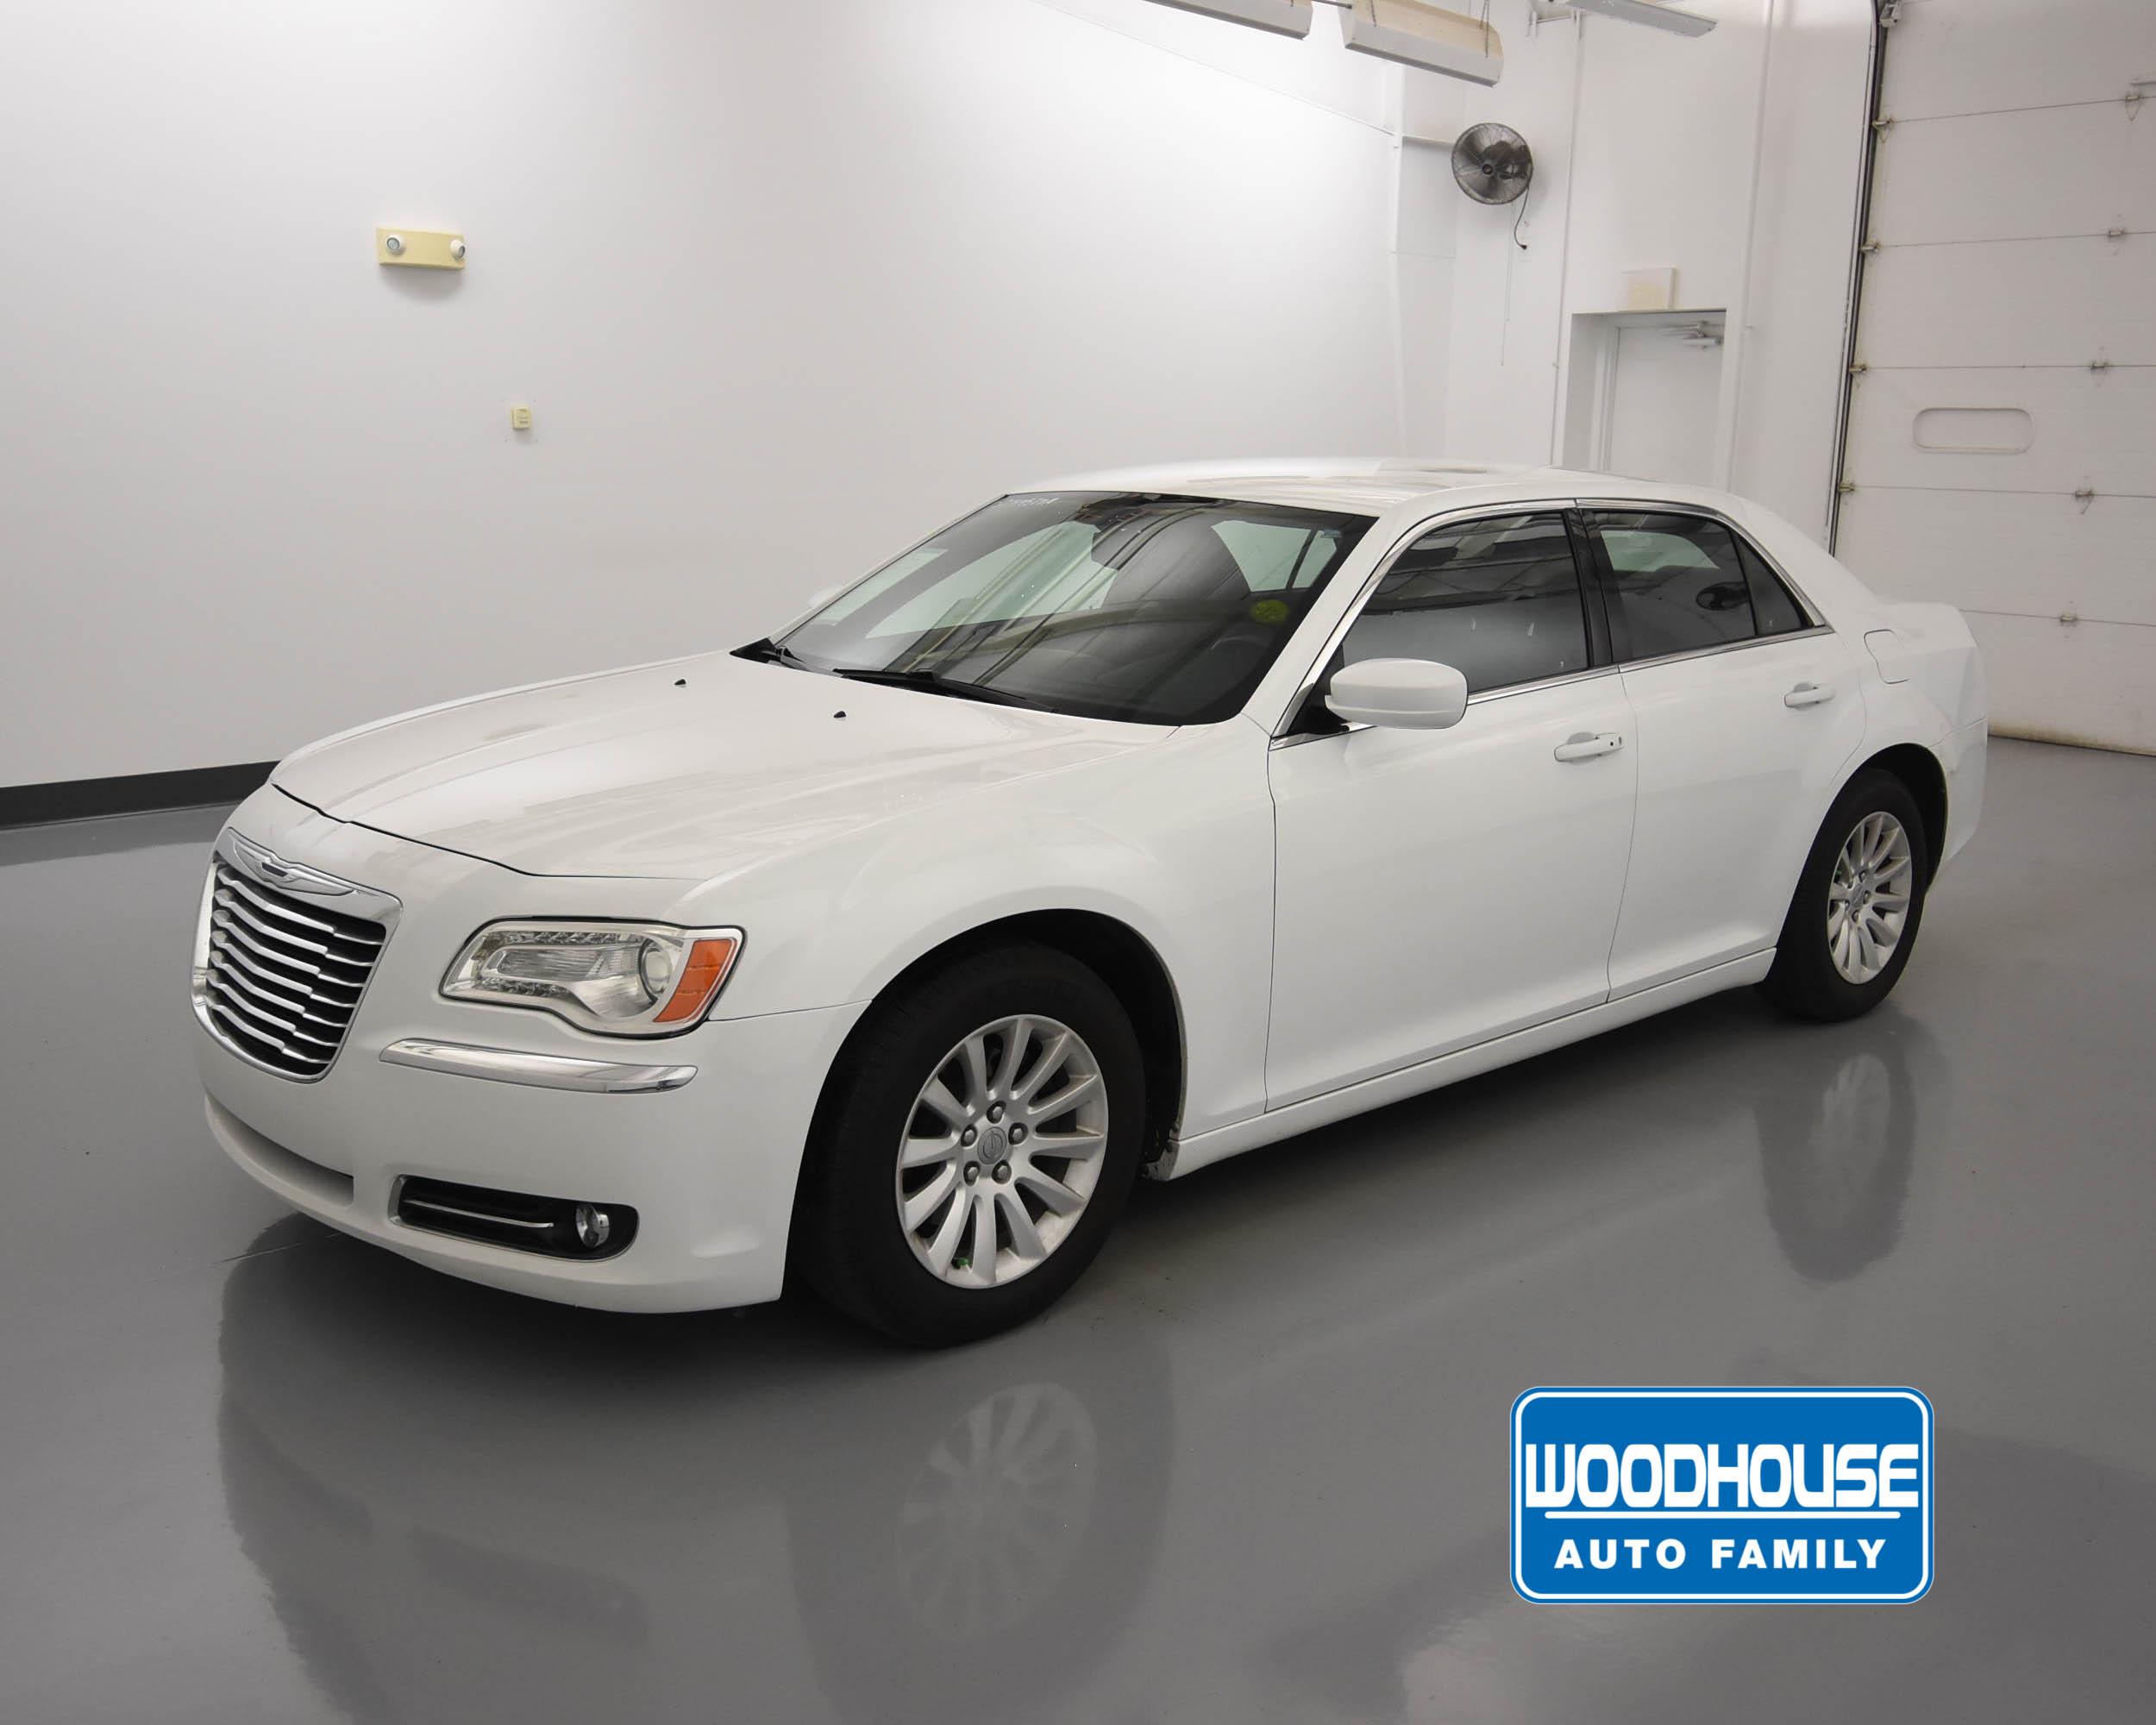 2013 Chrysler 300 For Sale >> Woodhouse Used 2013 Chrysler 300 For Sale Chrysler Dodge